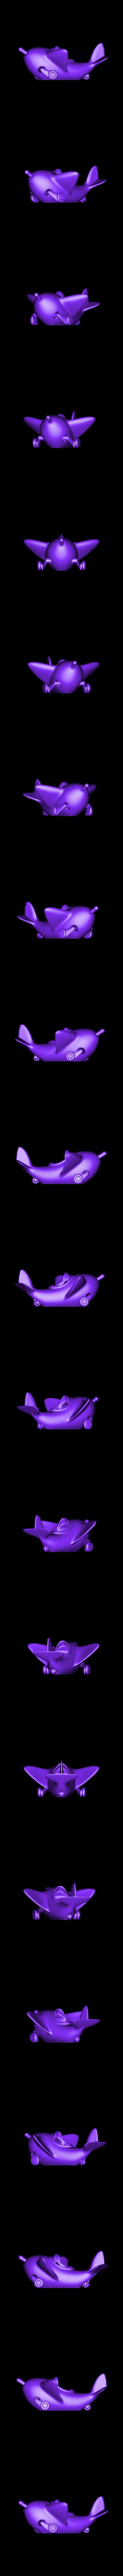 avion1.stl Download free STL file Avión #STRATOMAKER • Model to 3D print, AdrianoDElia